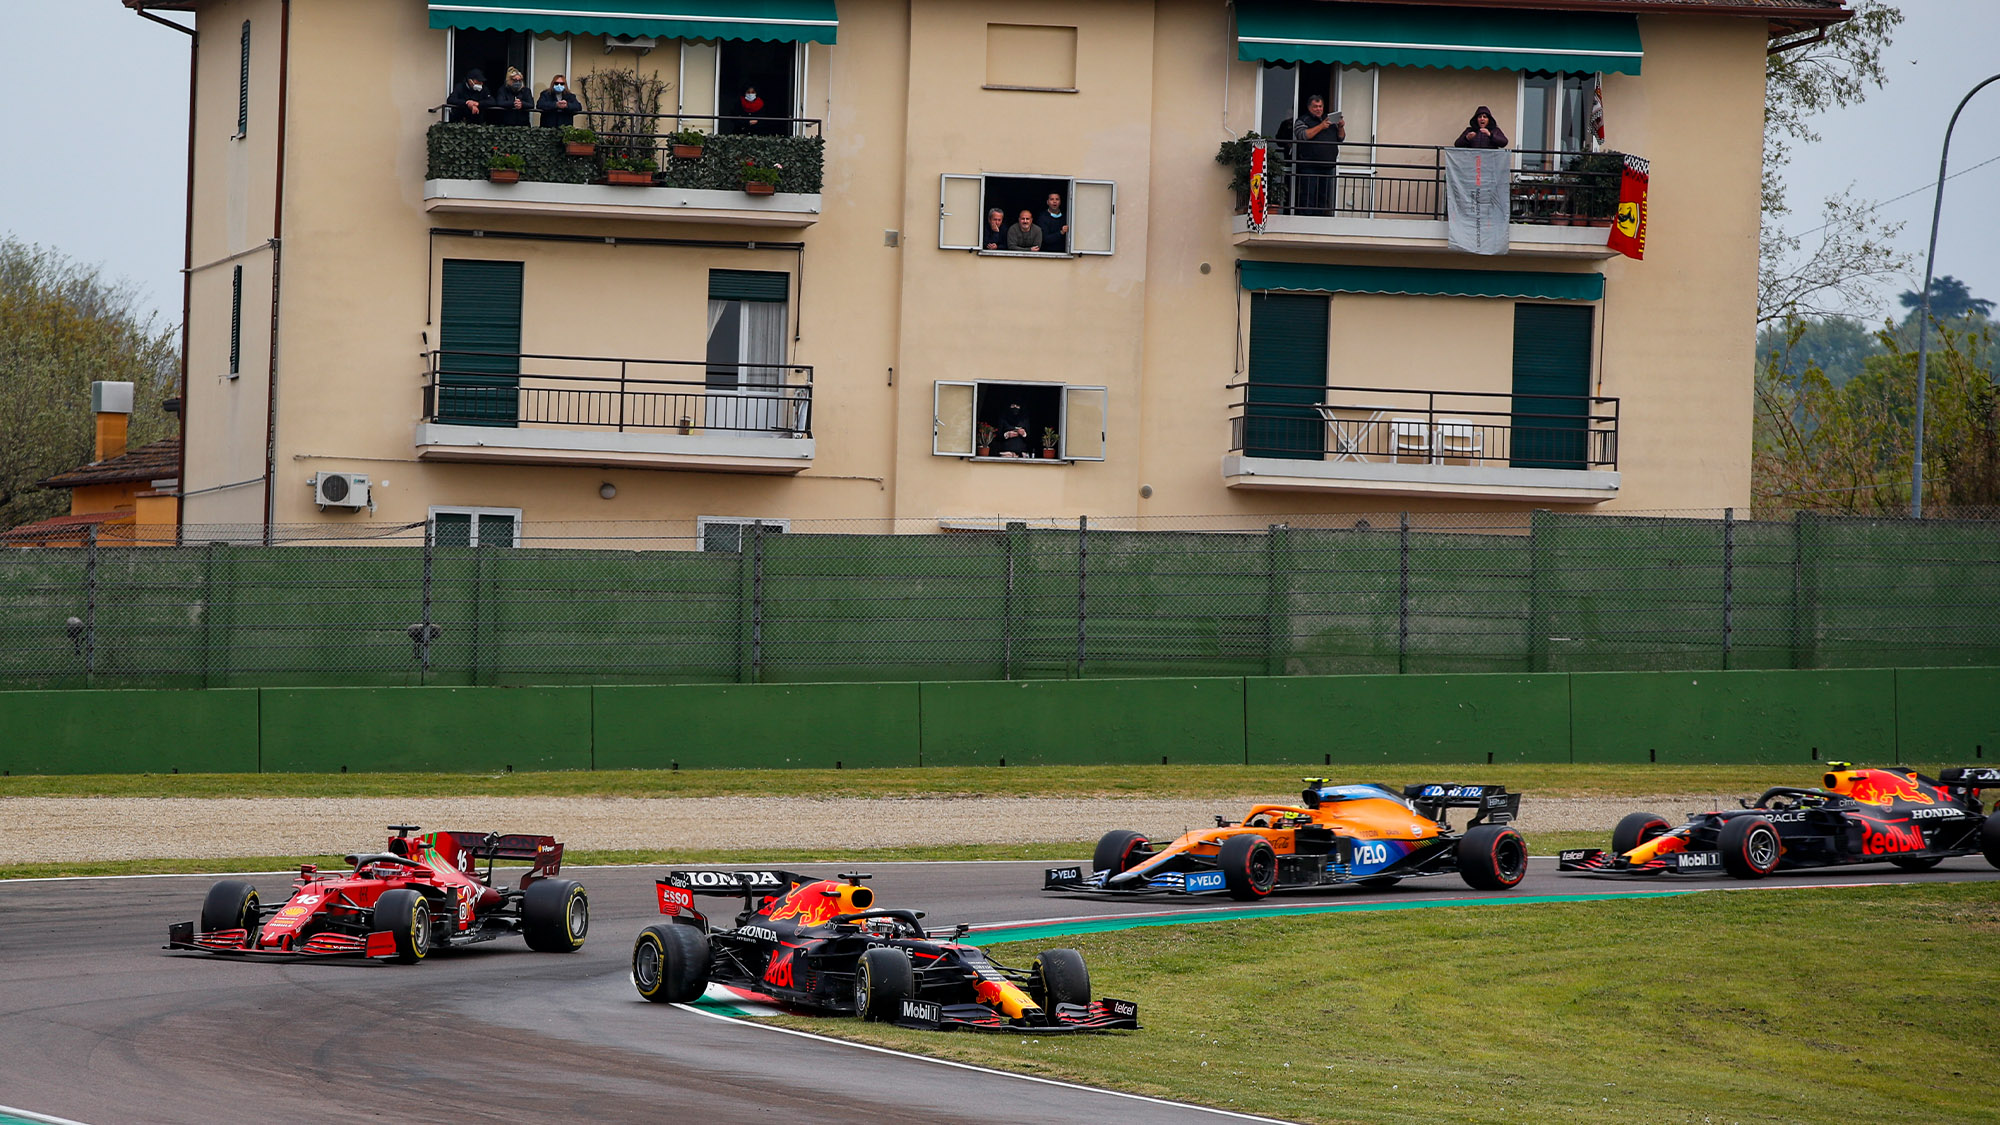 Max Verstappen runs onto the grass at the restart of the 2021 Emilia Romagna Grand Prix